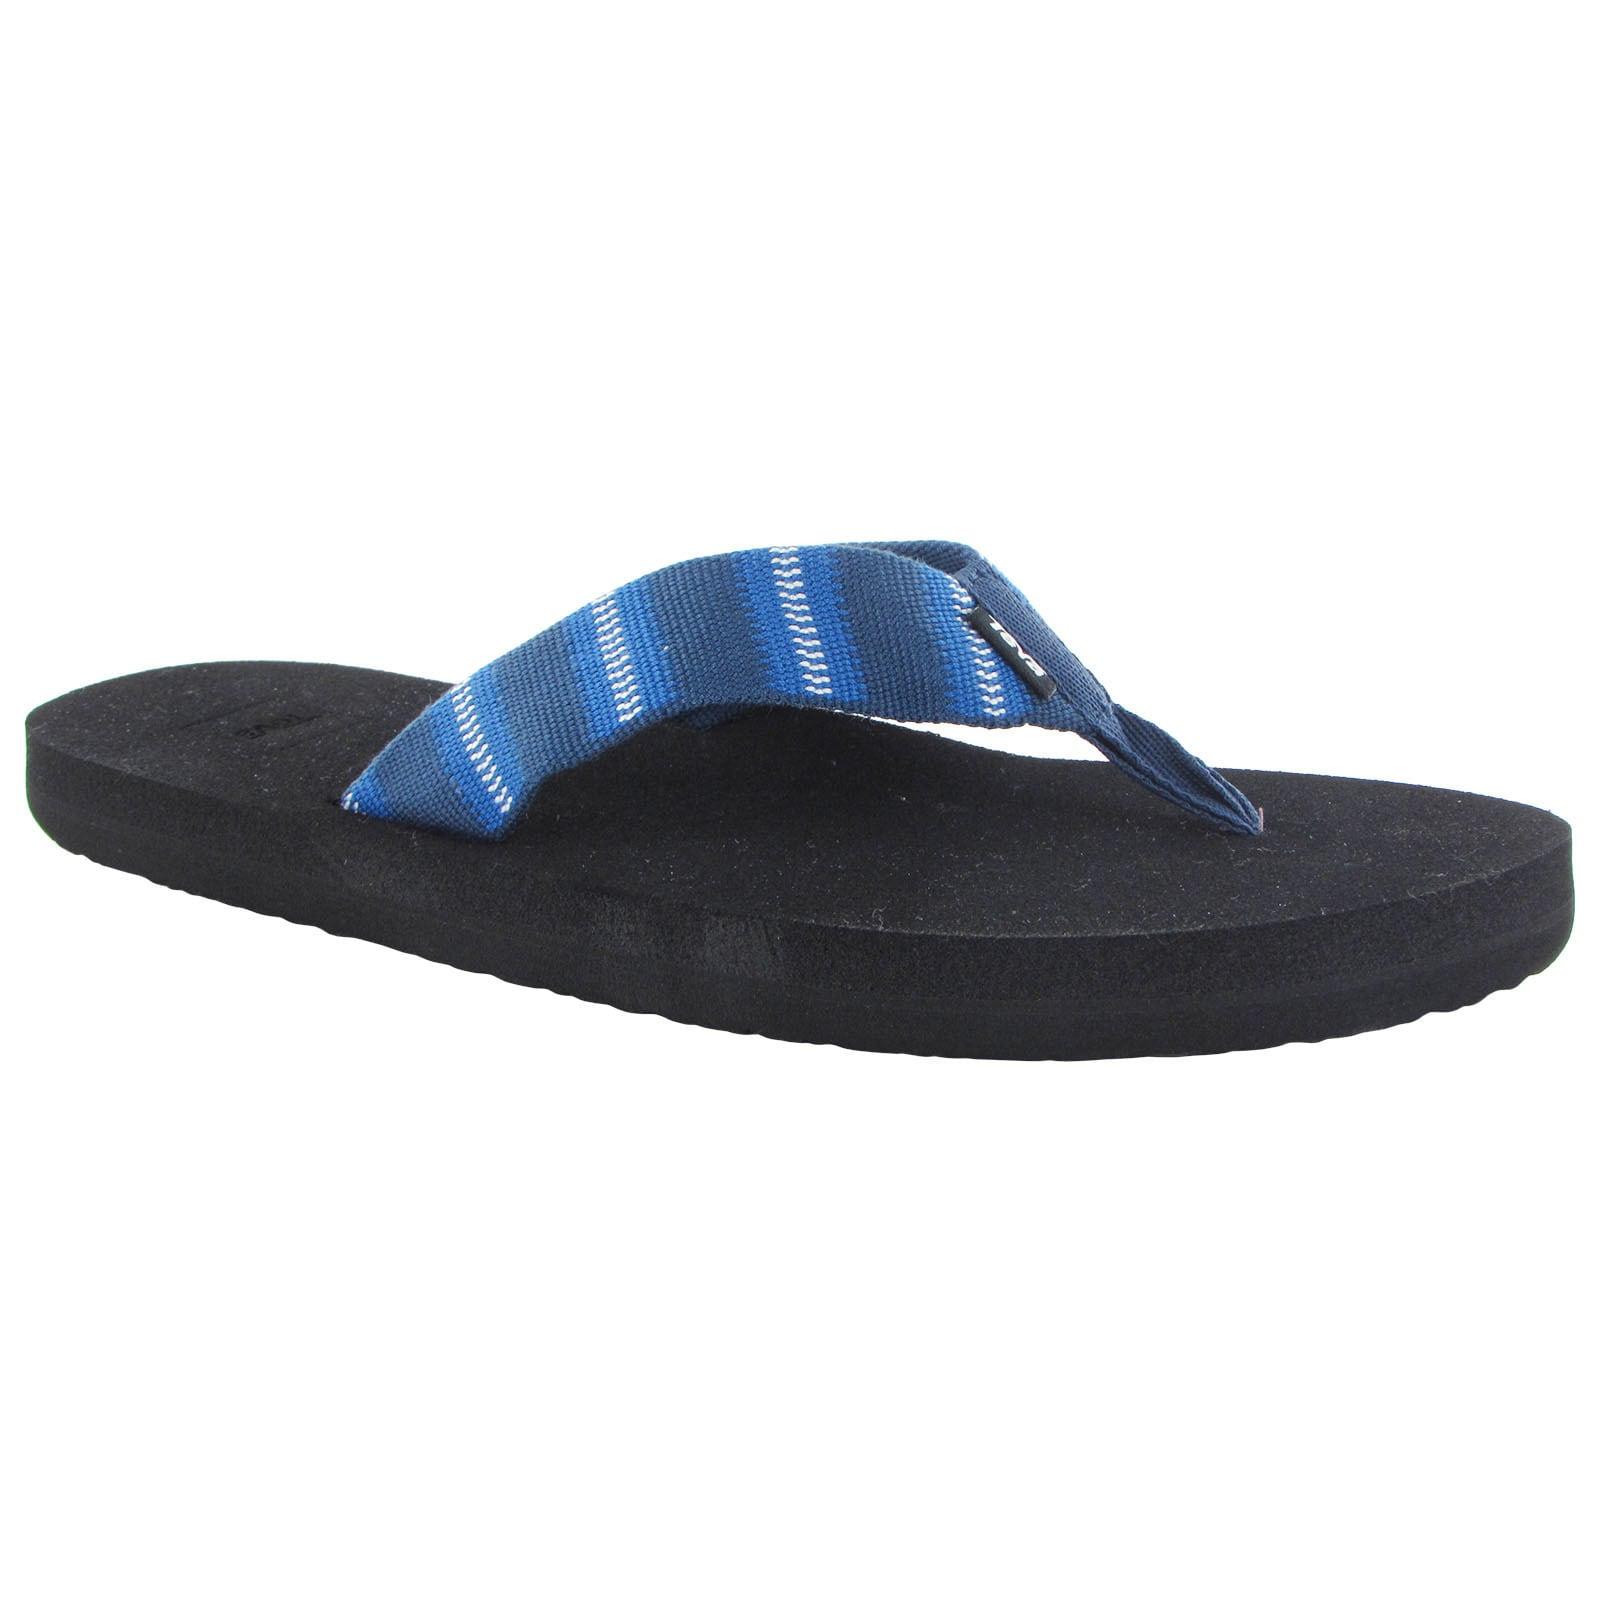 29524e34e Shop Teva Mens Mush II Flip Flop Sandals - On Sale - Free Shipping ...